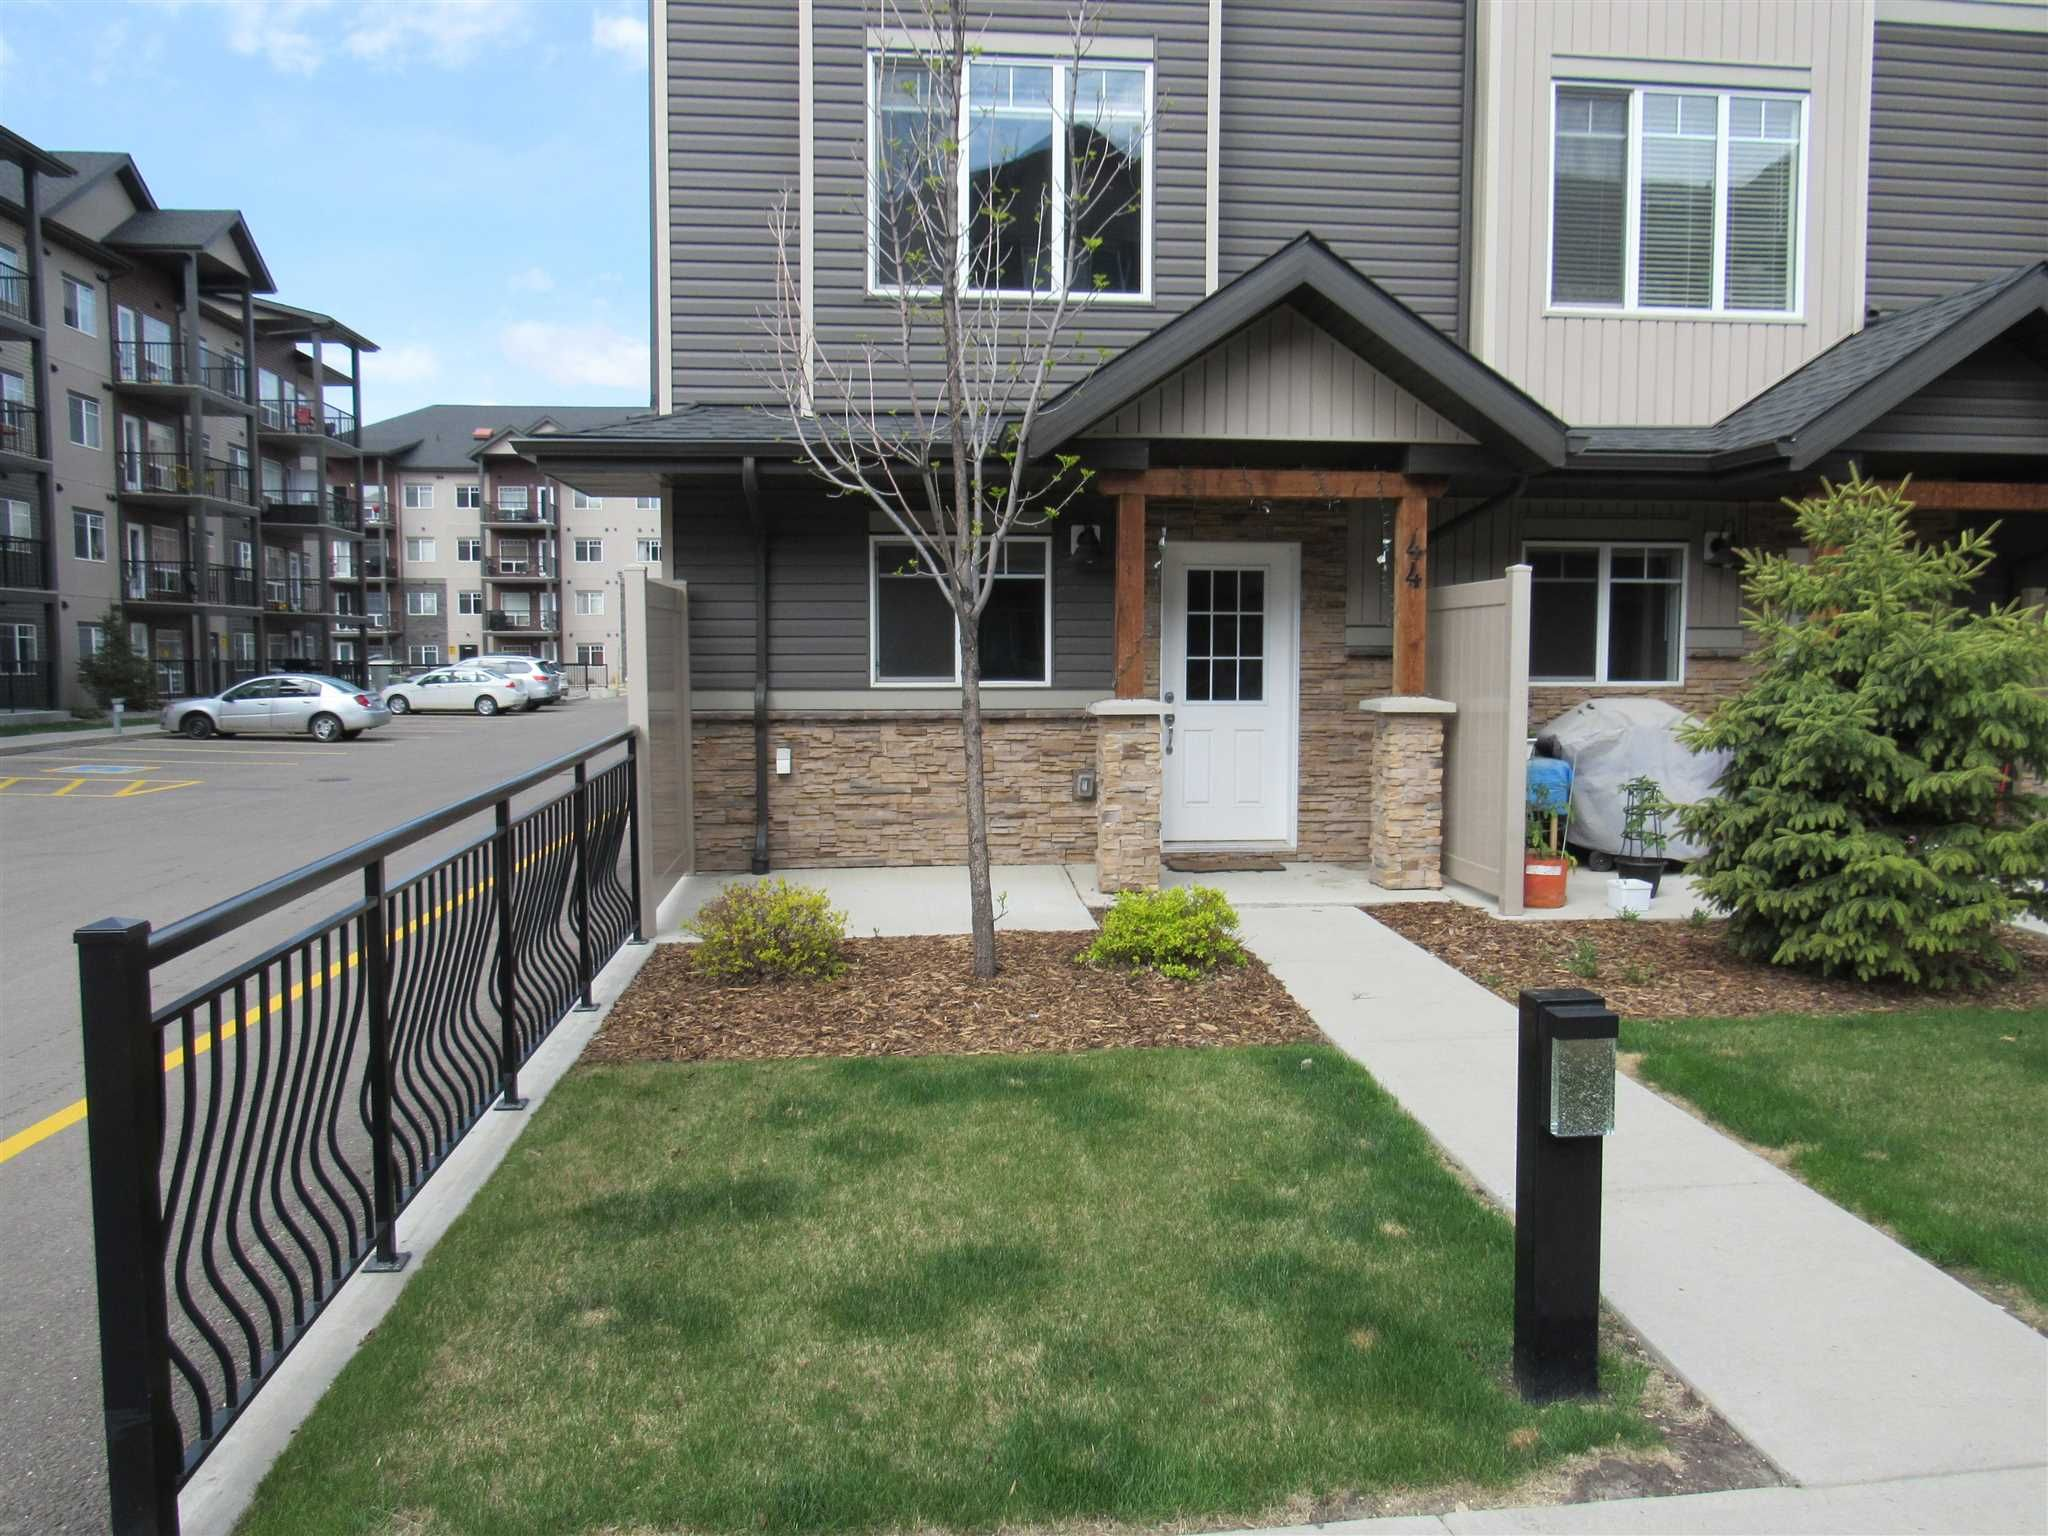 Main Photo: 44 9515 160 Avenue in Edmonton: Zone 28 Townhouse for sale : MLS®# E4246005